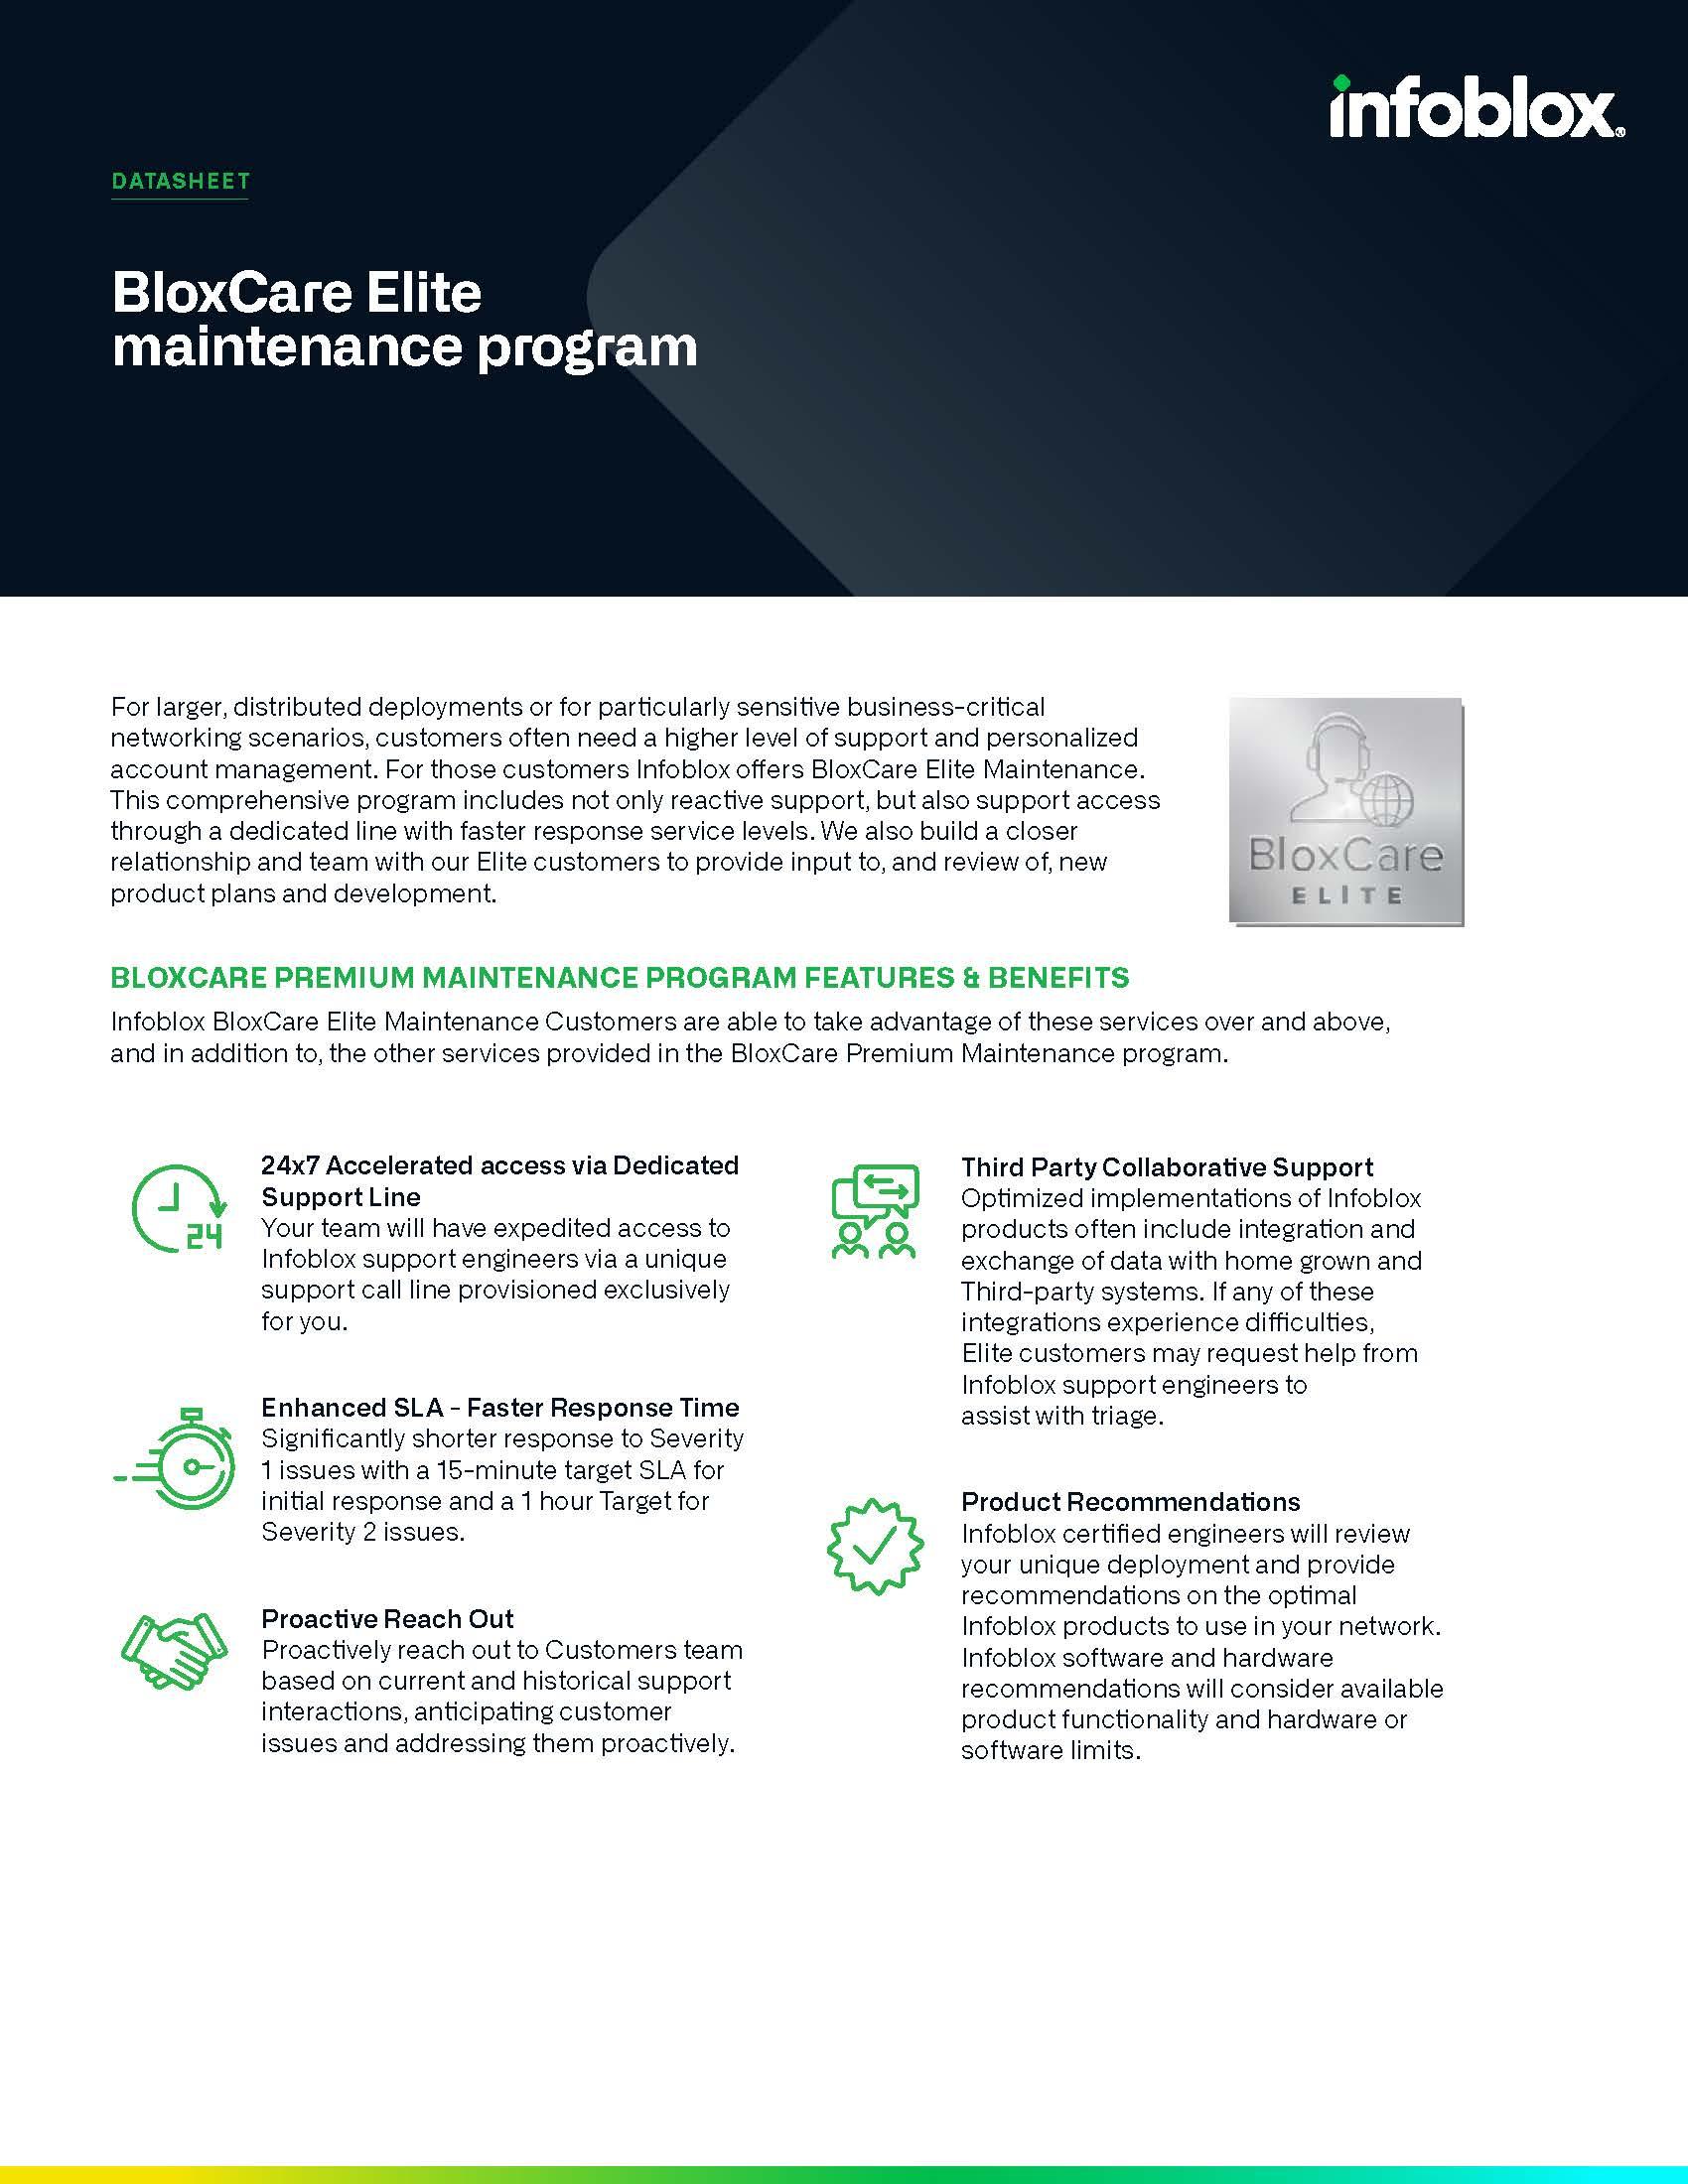 BloxCare Elite Maintenance Program